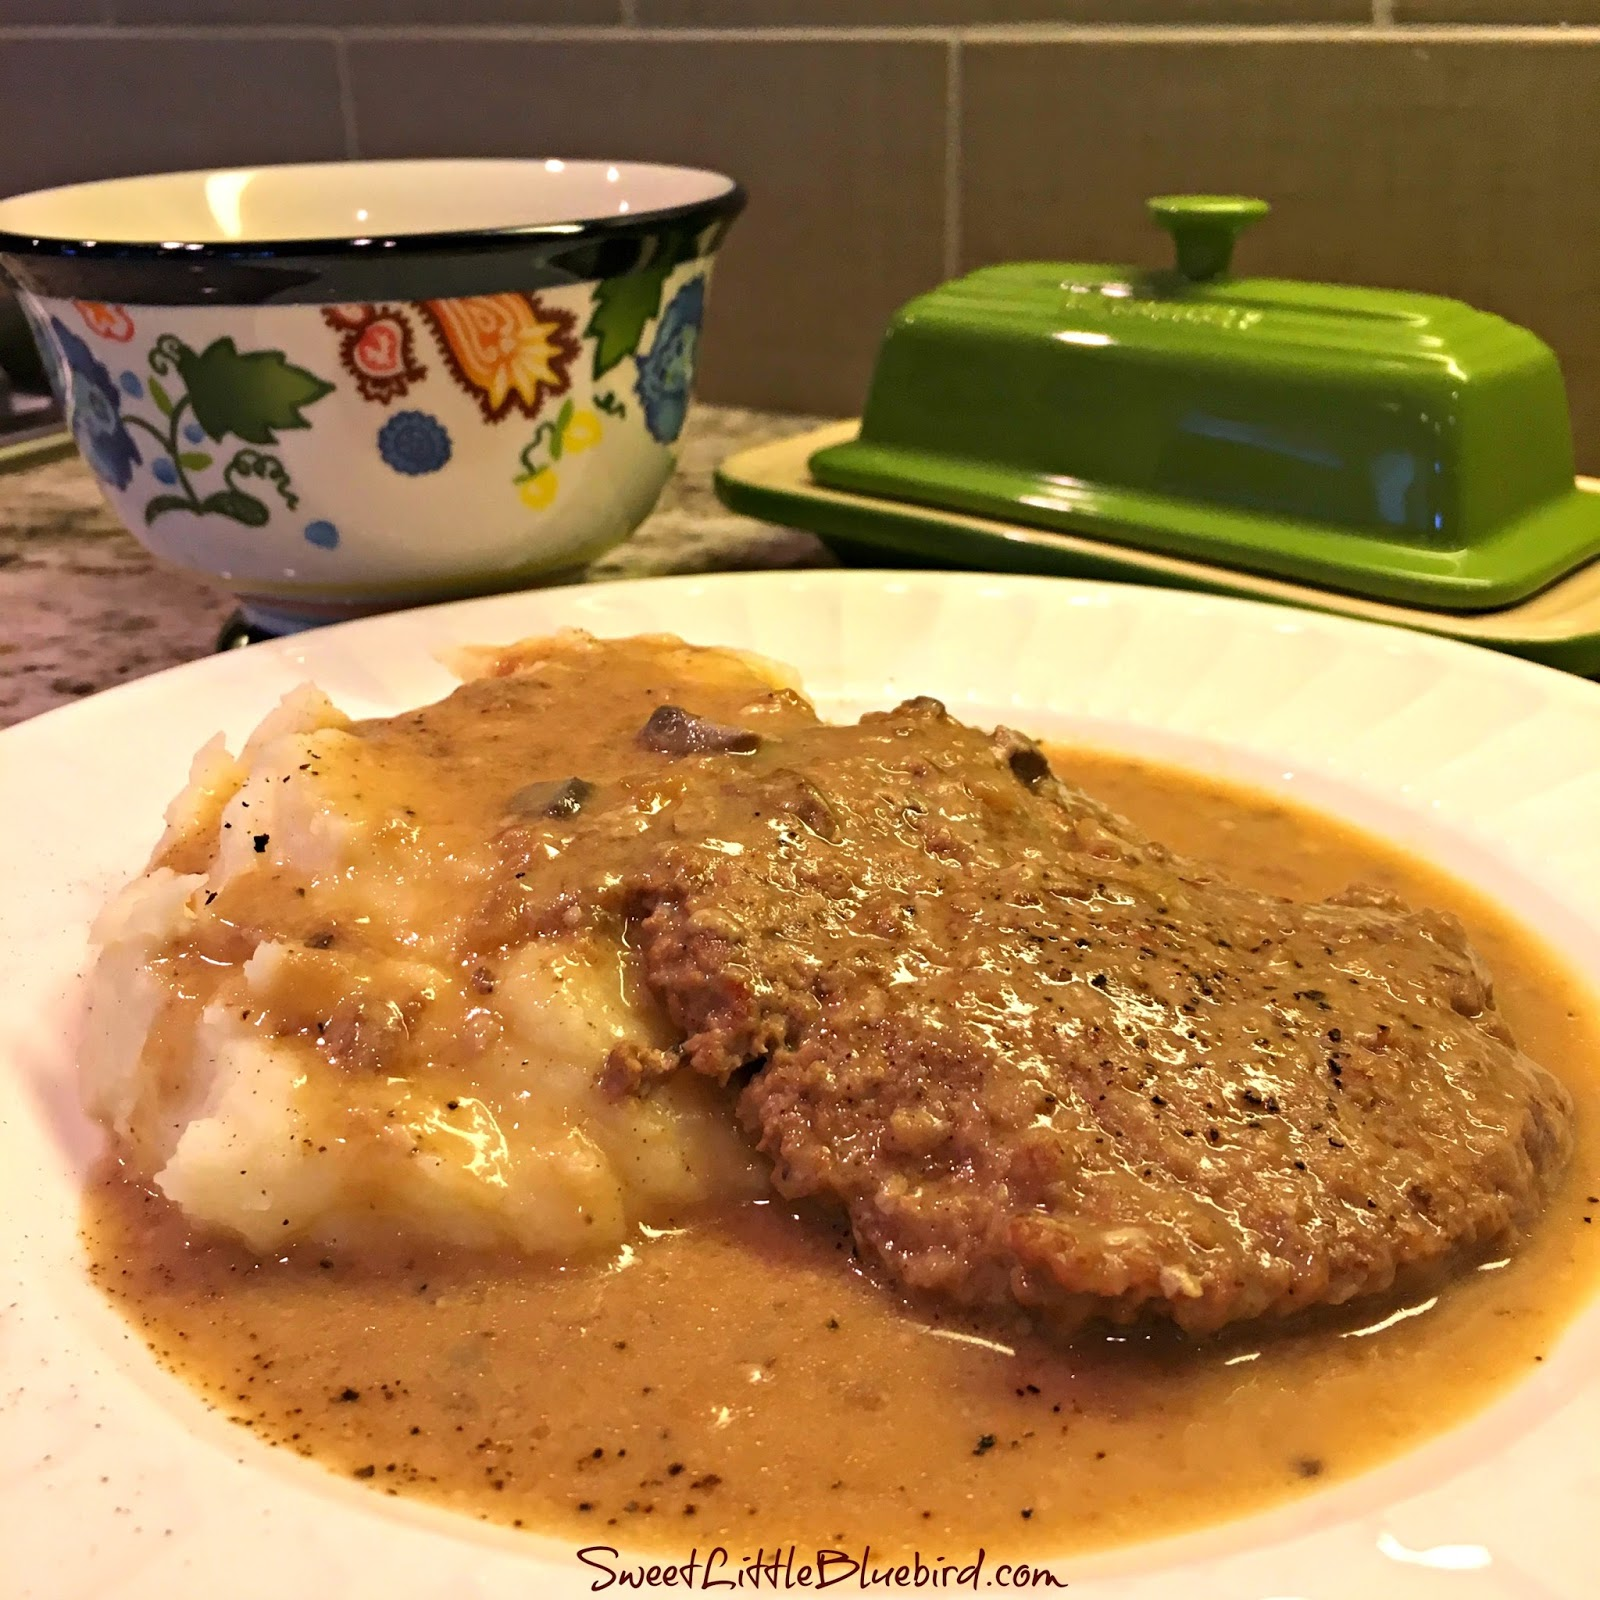 Cube steak with gravy recipes easy